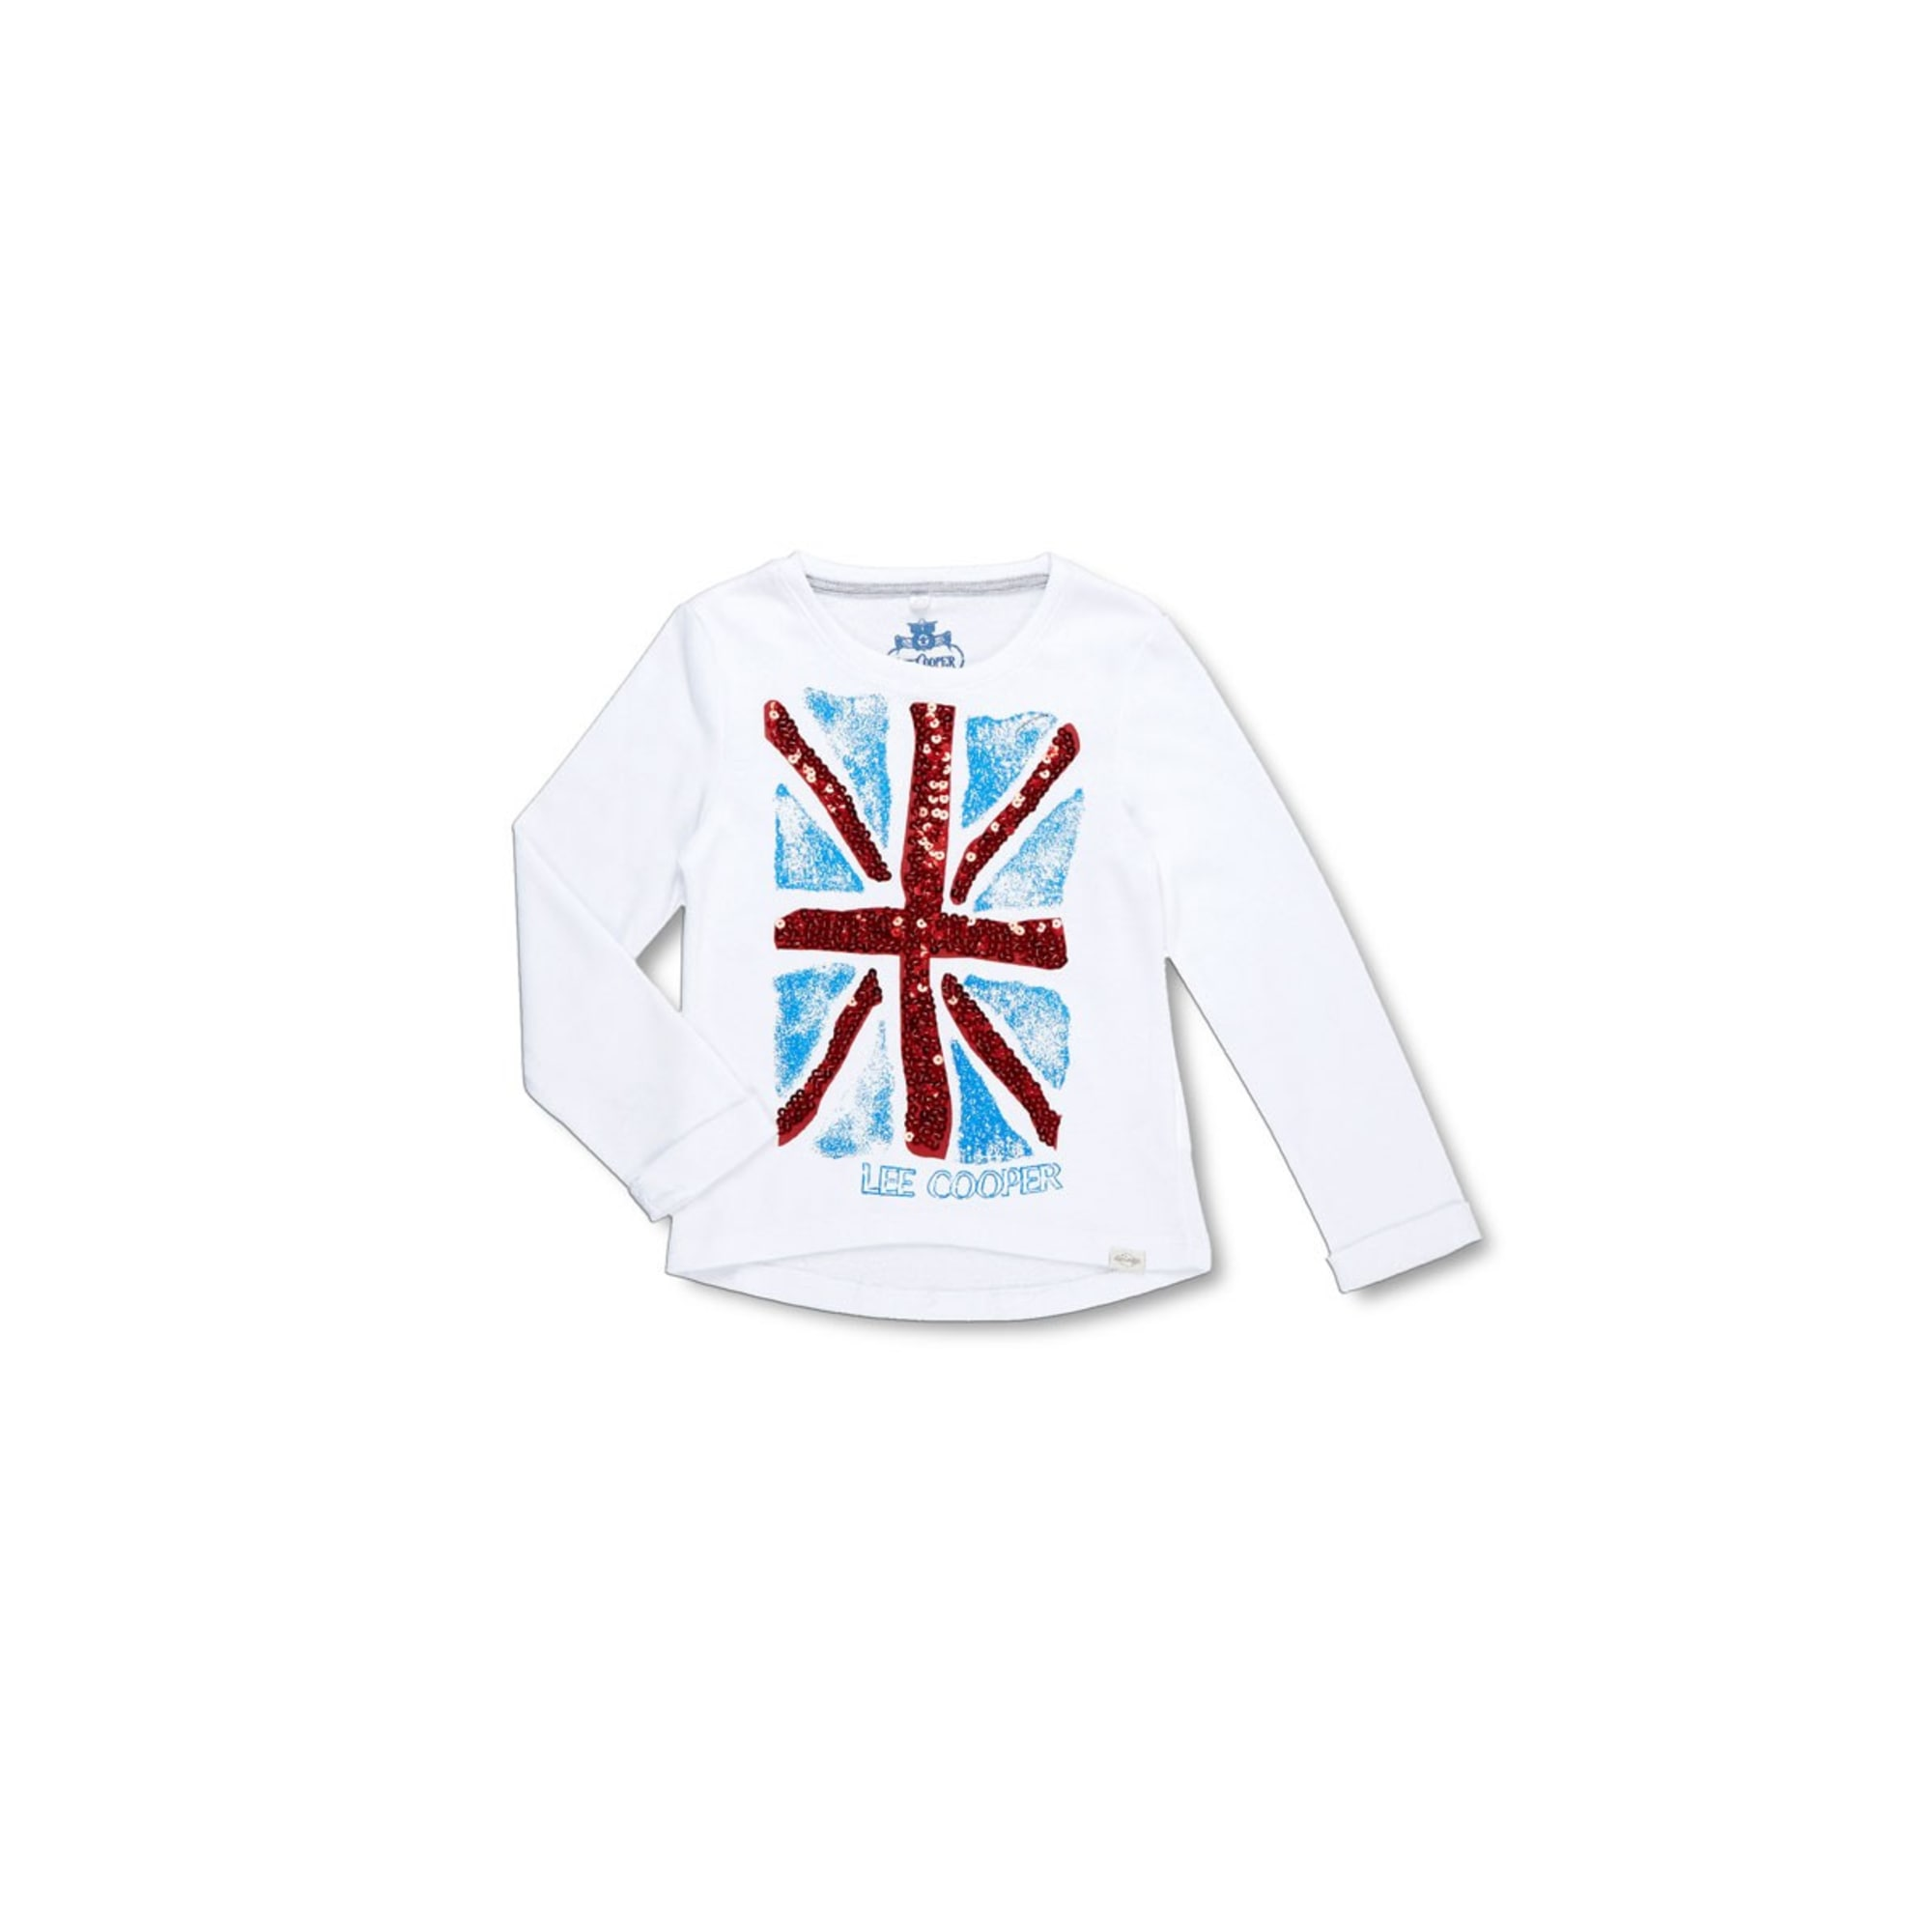 Top, Tee-shirt LEE COOPER Gris, anthracite